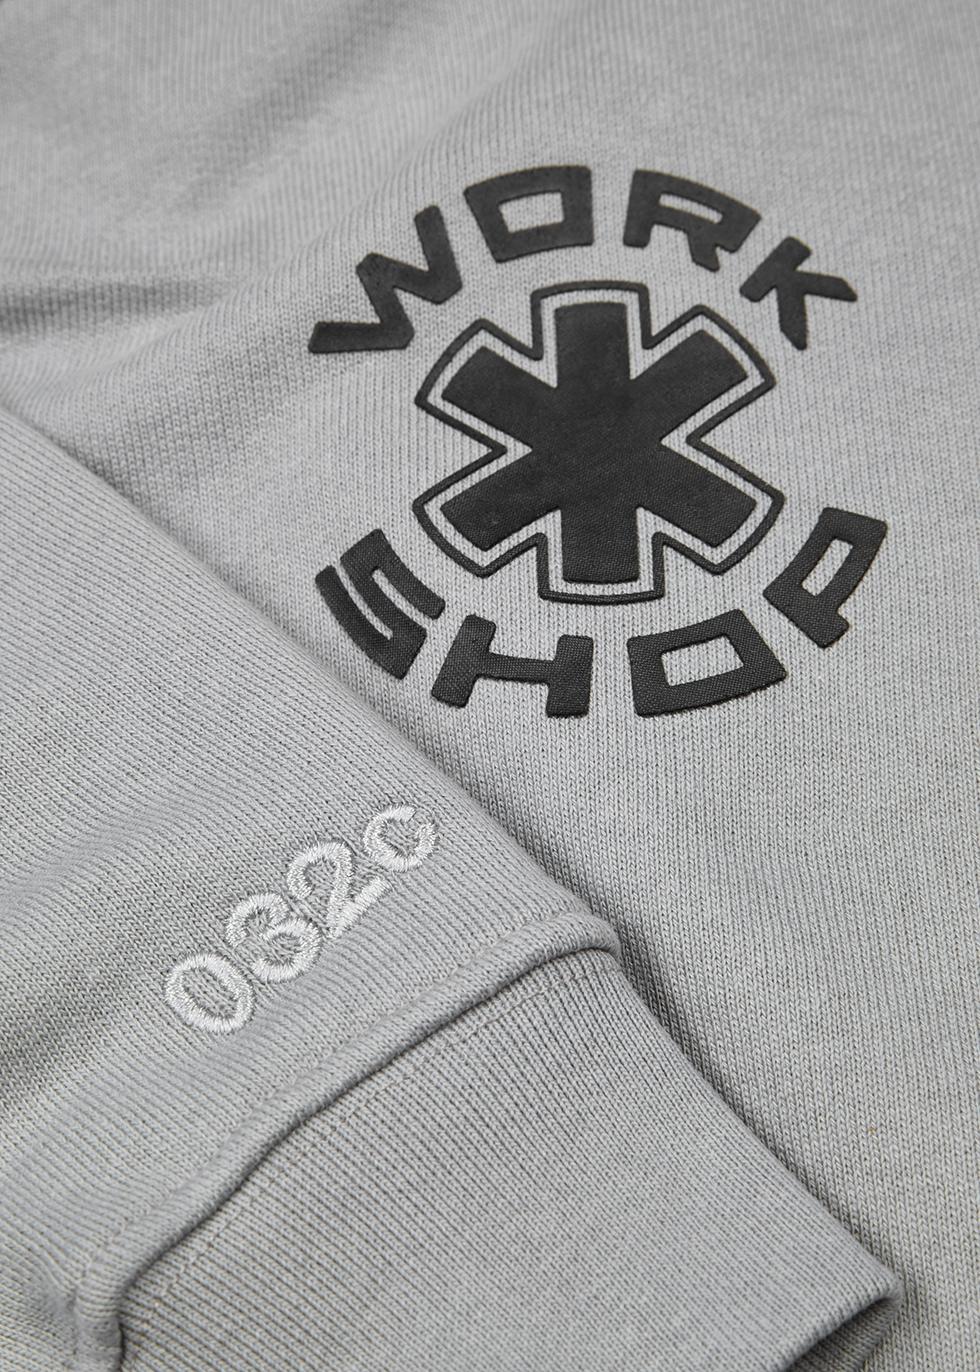 Grey printed cotton sweatshirt - 032c